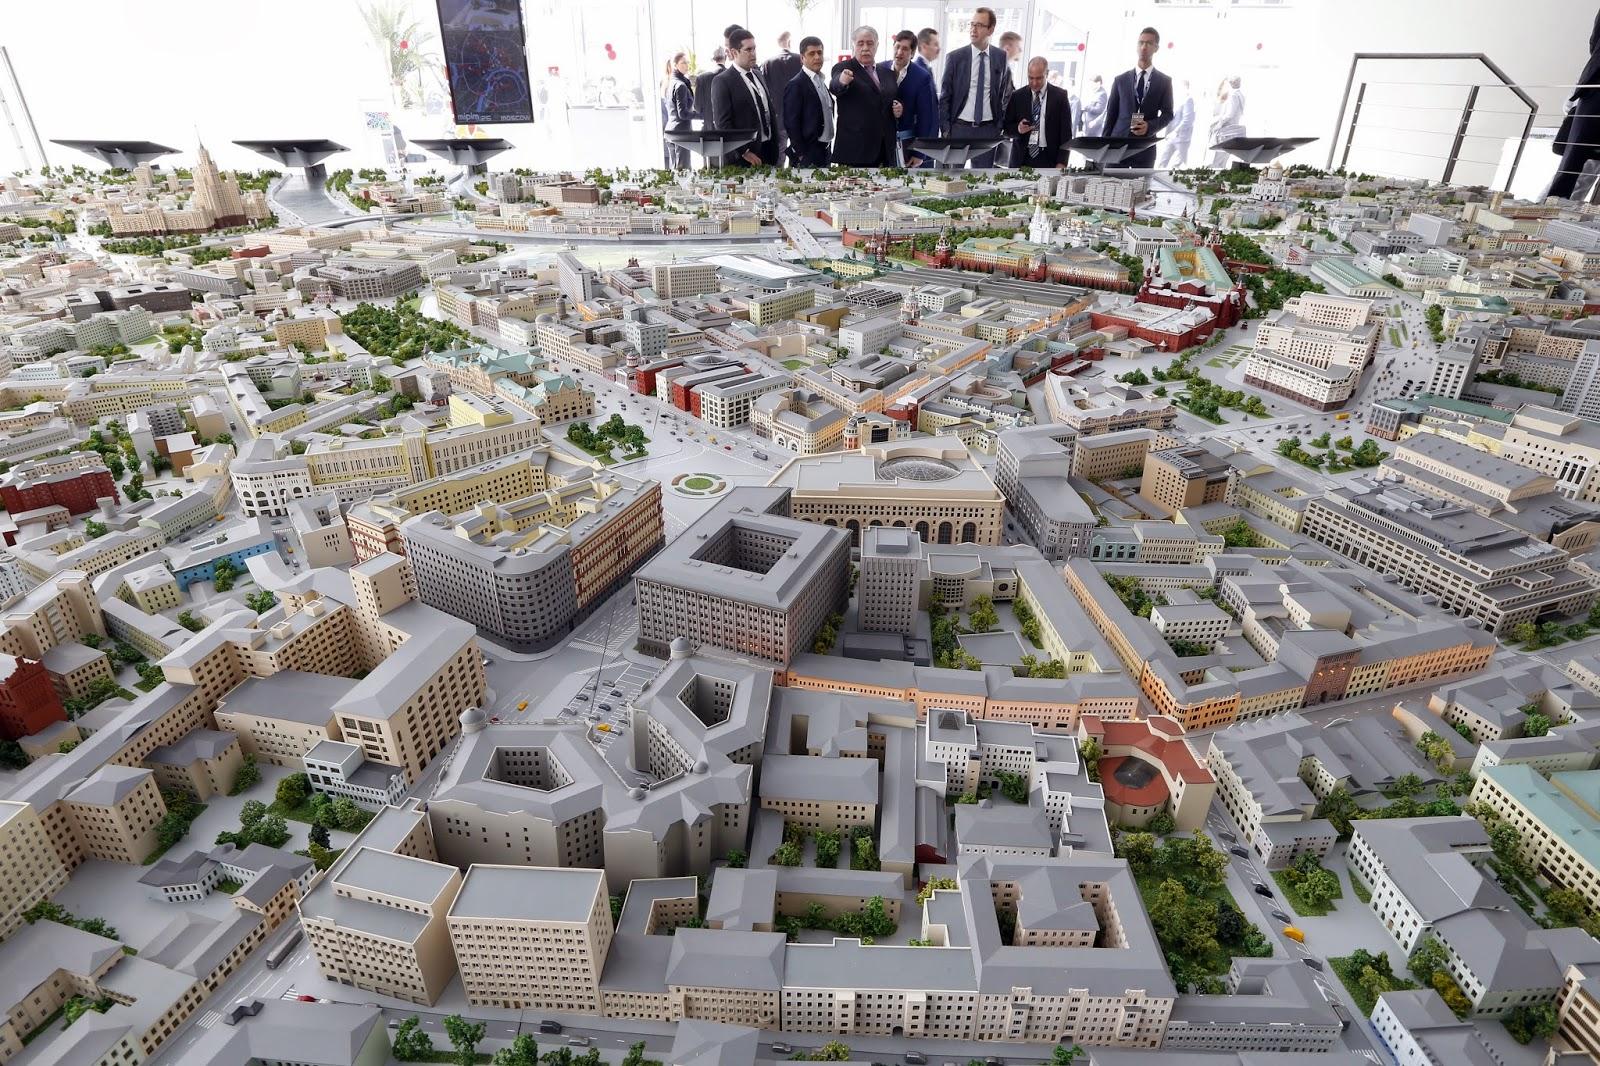 Architecture, Business, Cannes, City Scale Models, Dubai, Economy, France, London, MIPIM, Moscow, Palais des Festivals, Real Estate, Real Estate Festival, Real Estate Show, Scale Models,